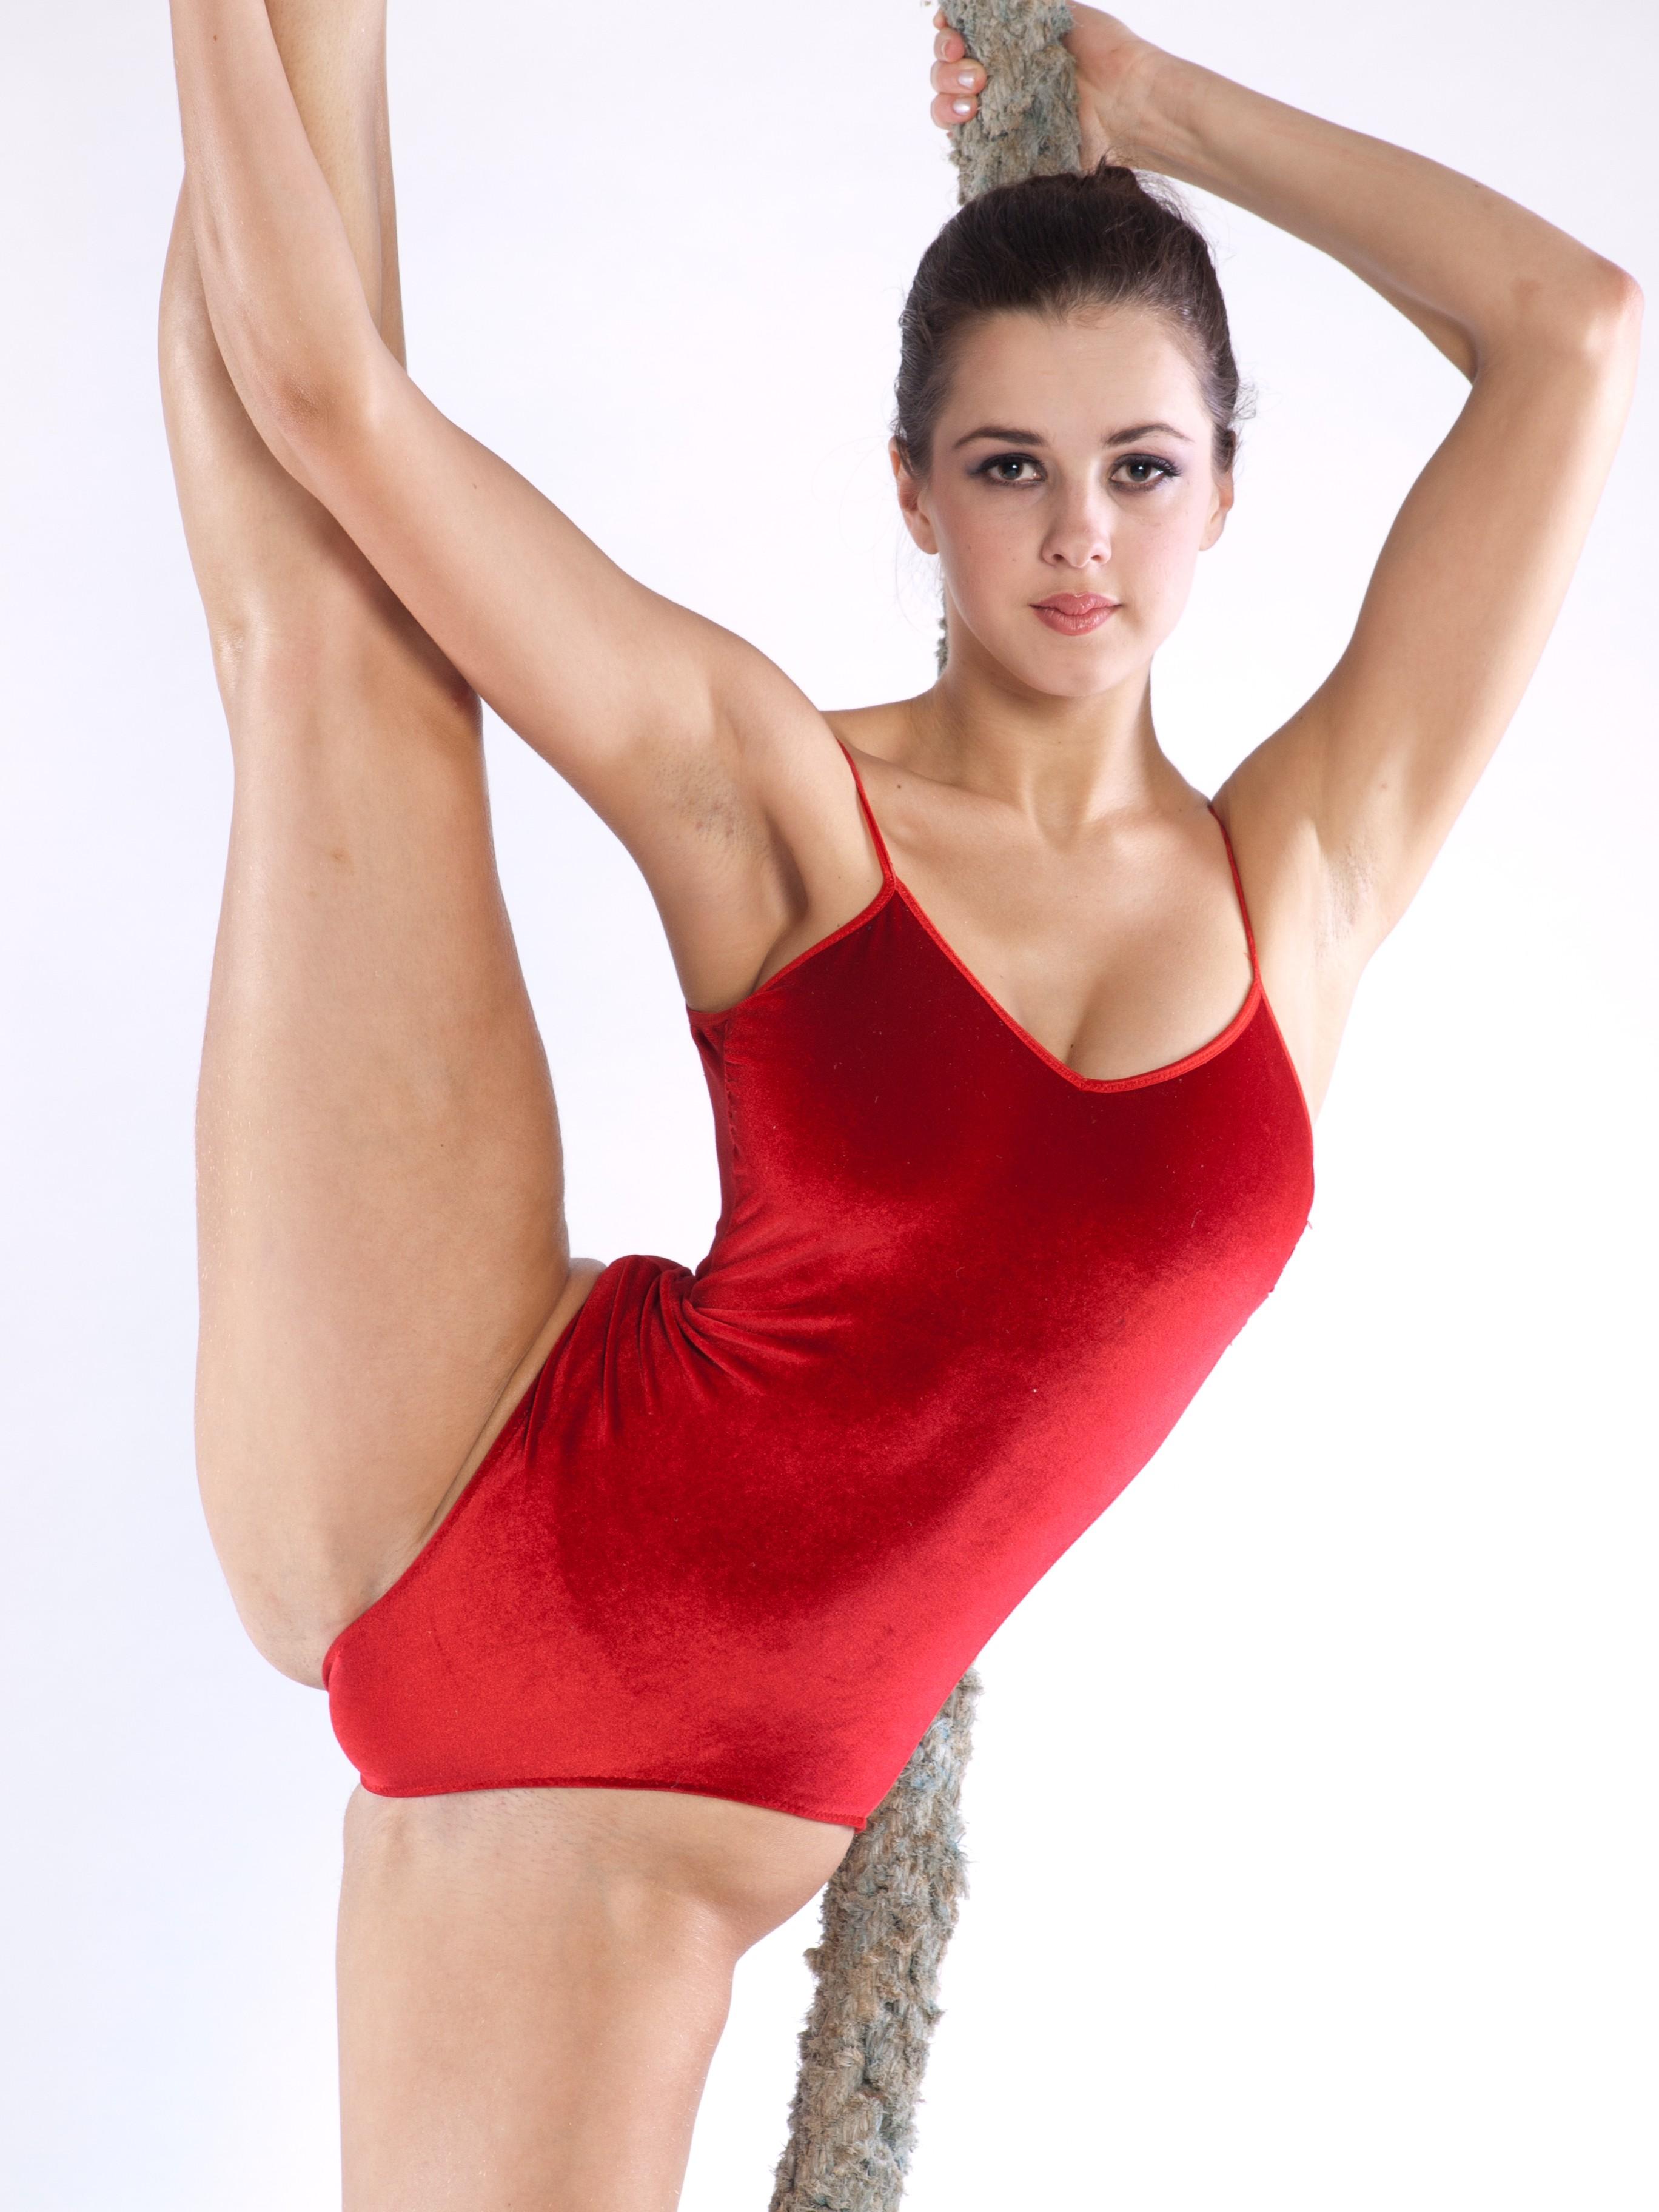 gimnastki-v-kupalnikah-erotika